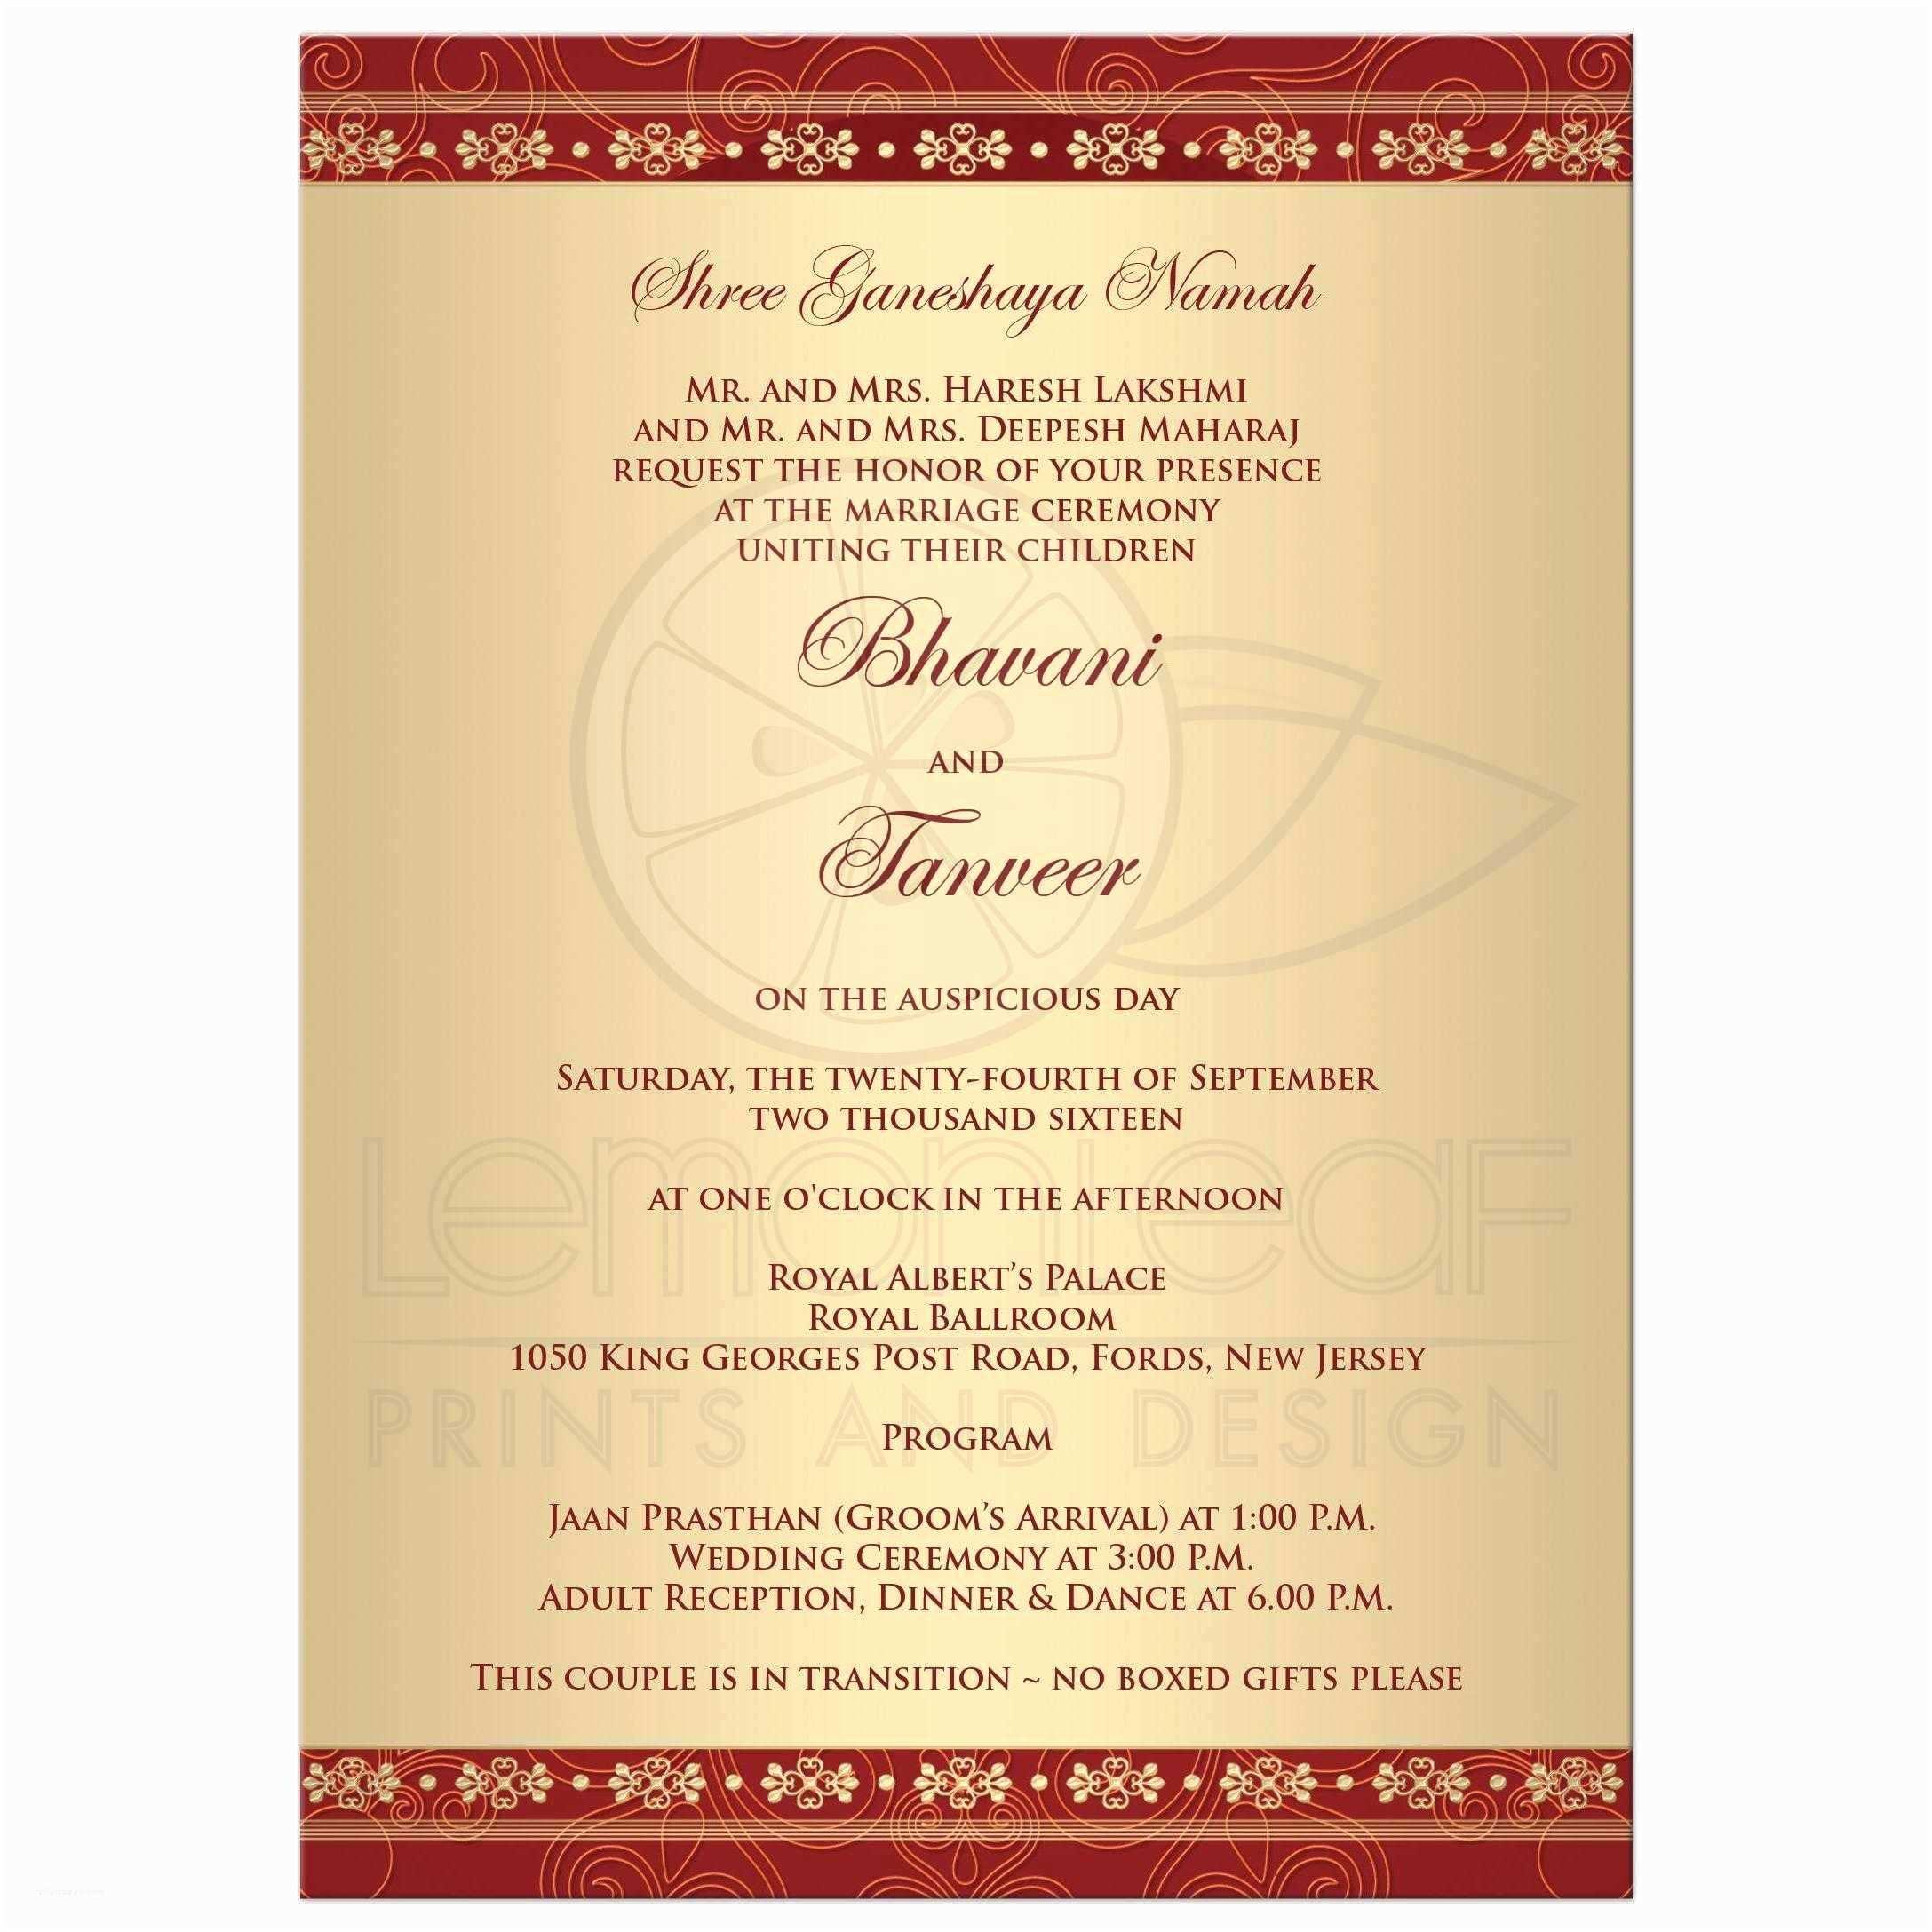 Wedding Invitation Cards Samples Wedding Invitation Indian Wedding Invitation Cards